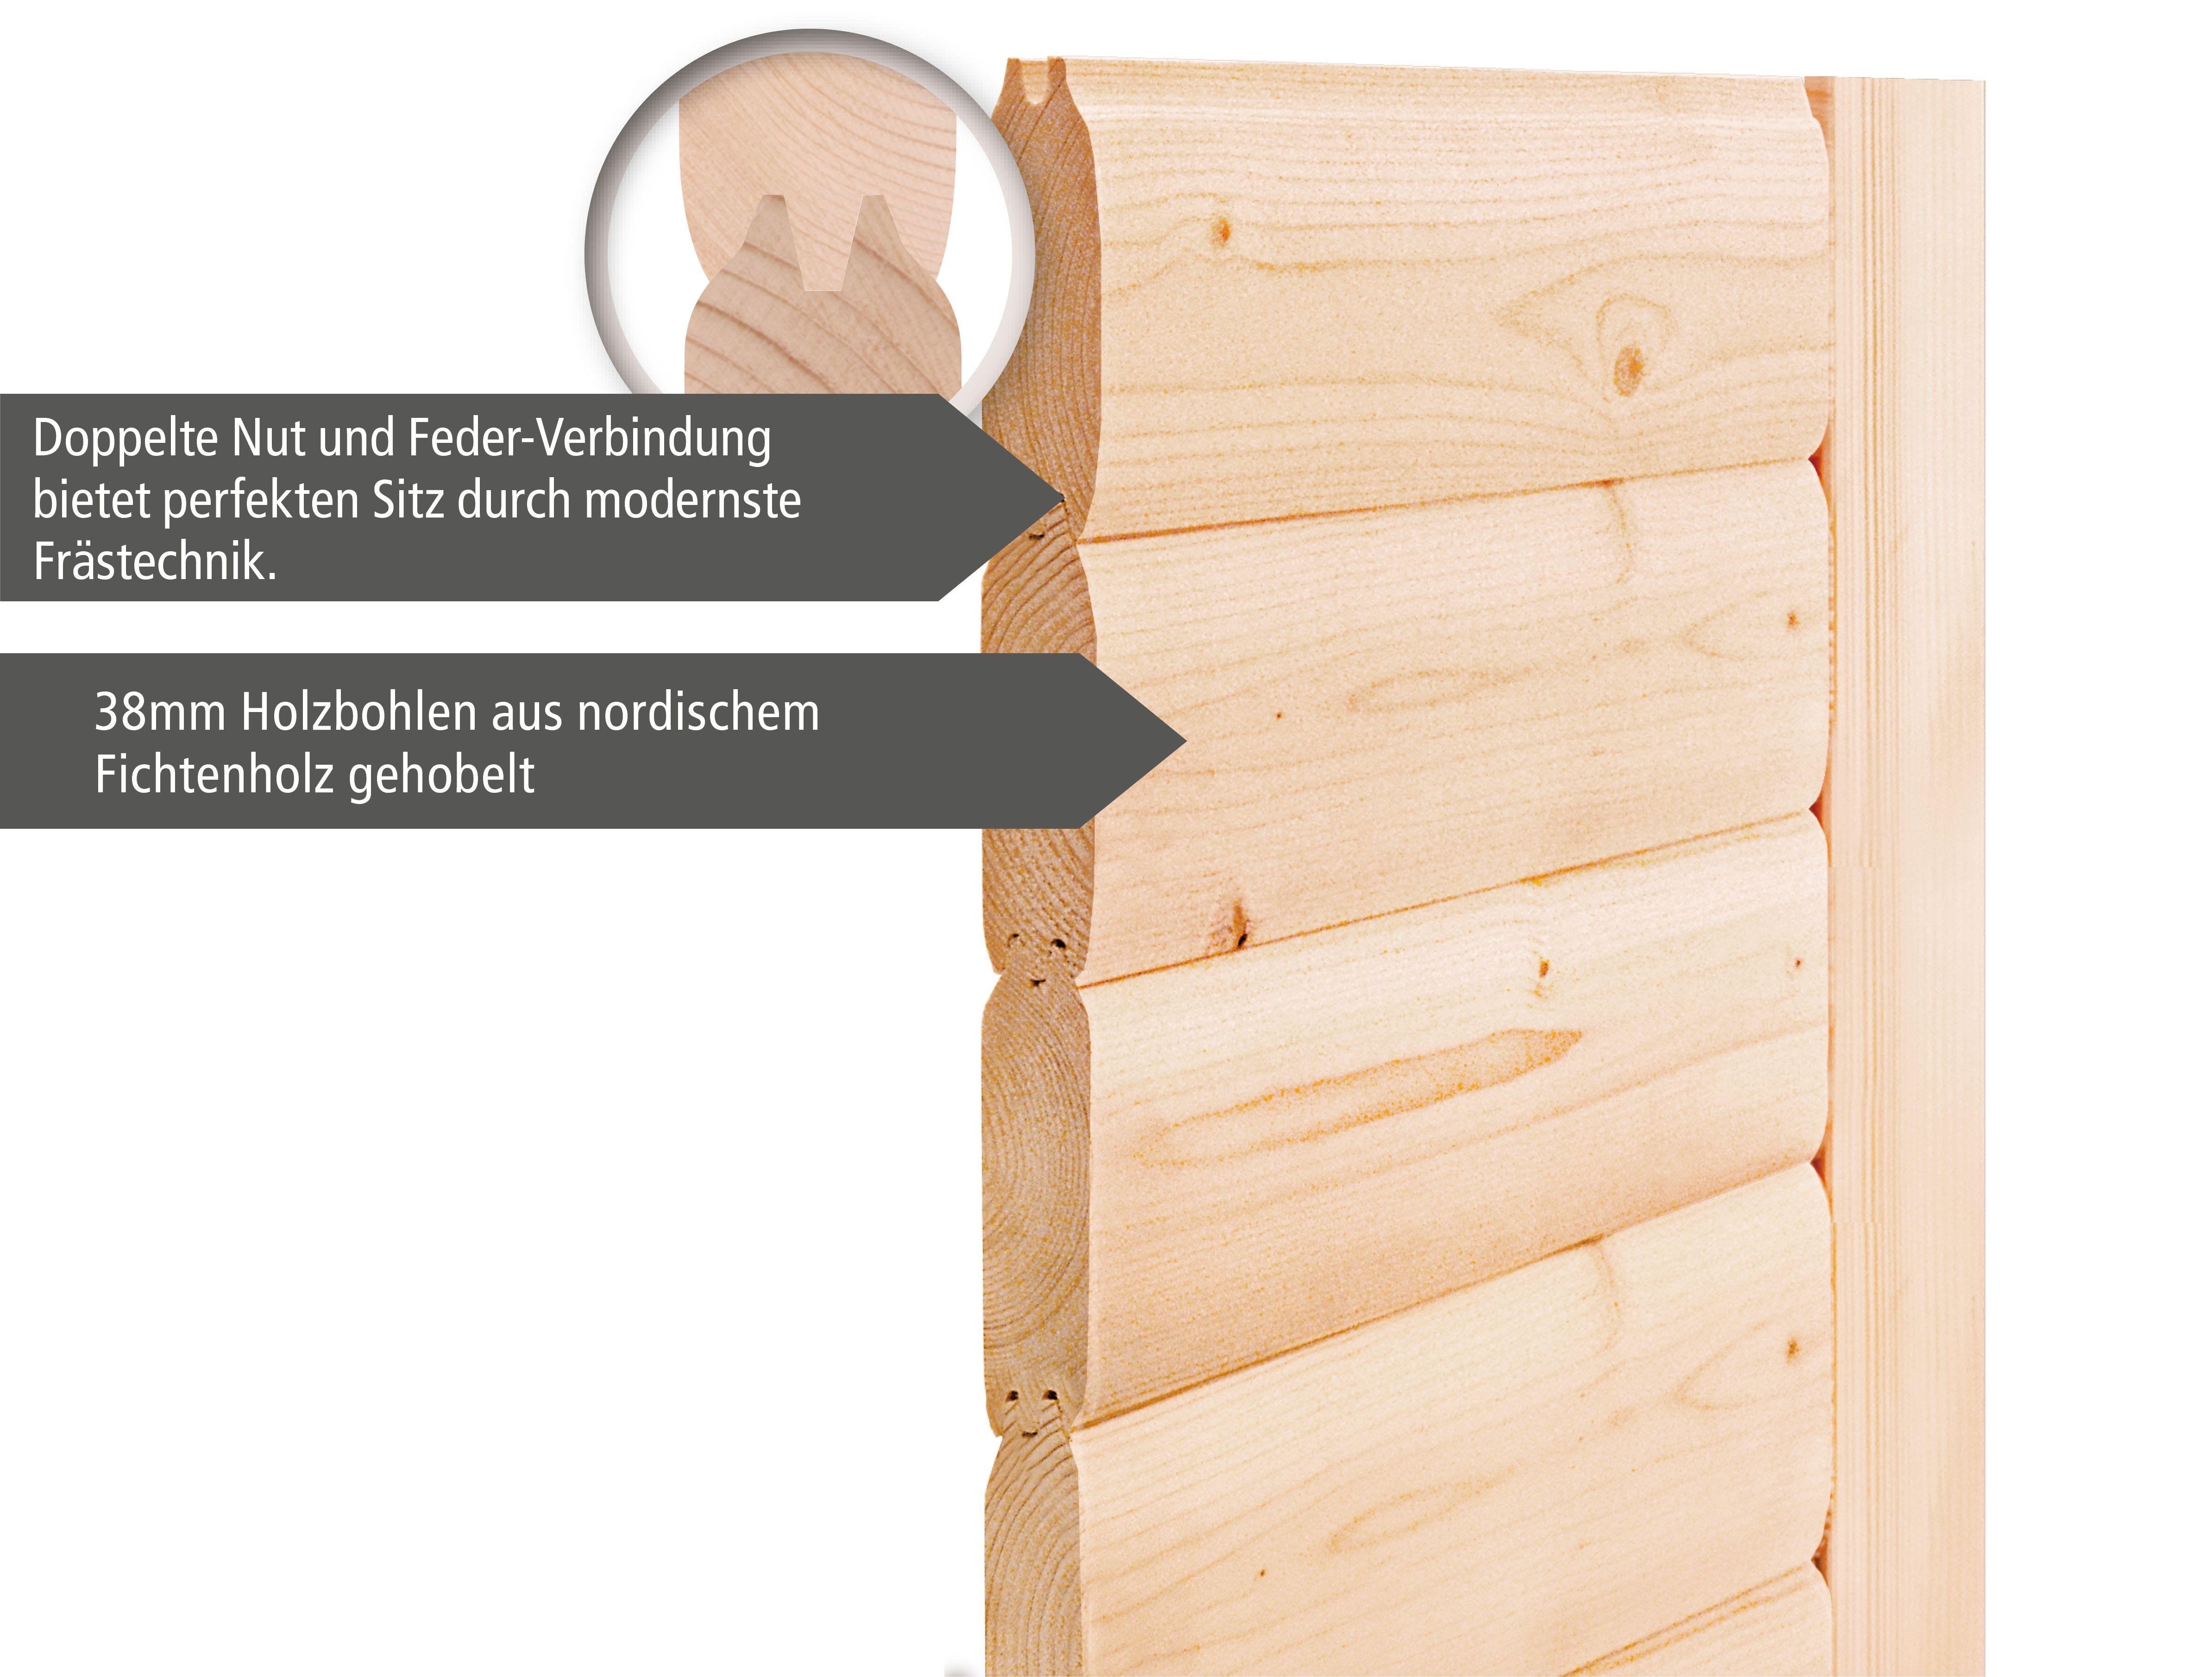 Woodfeeling Sauna Selena 38mm Dachkranz ohne Saunaofen Bild 2